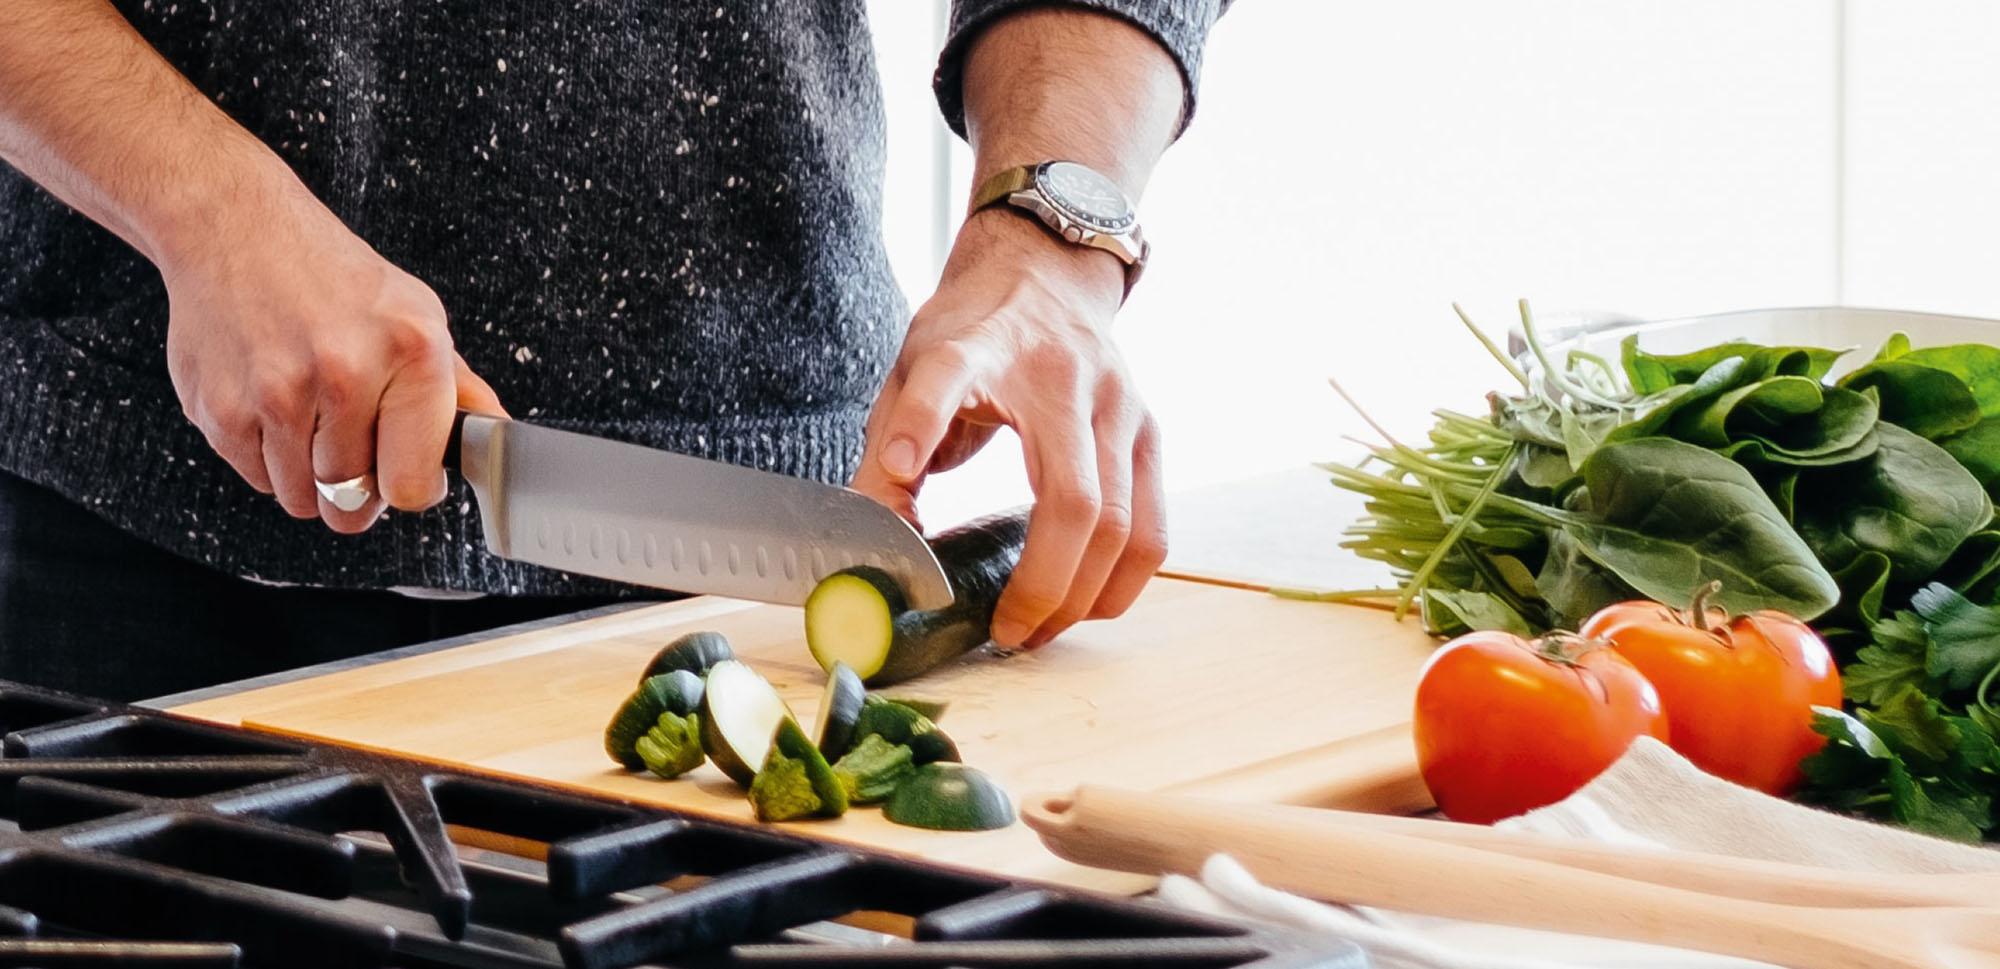 Mann schneidet Gemüse